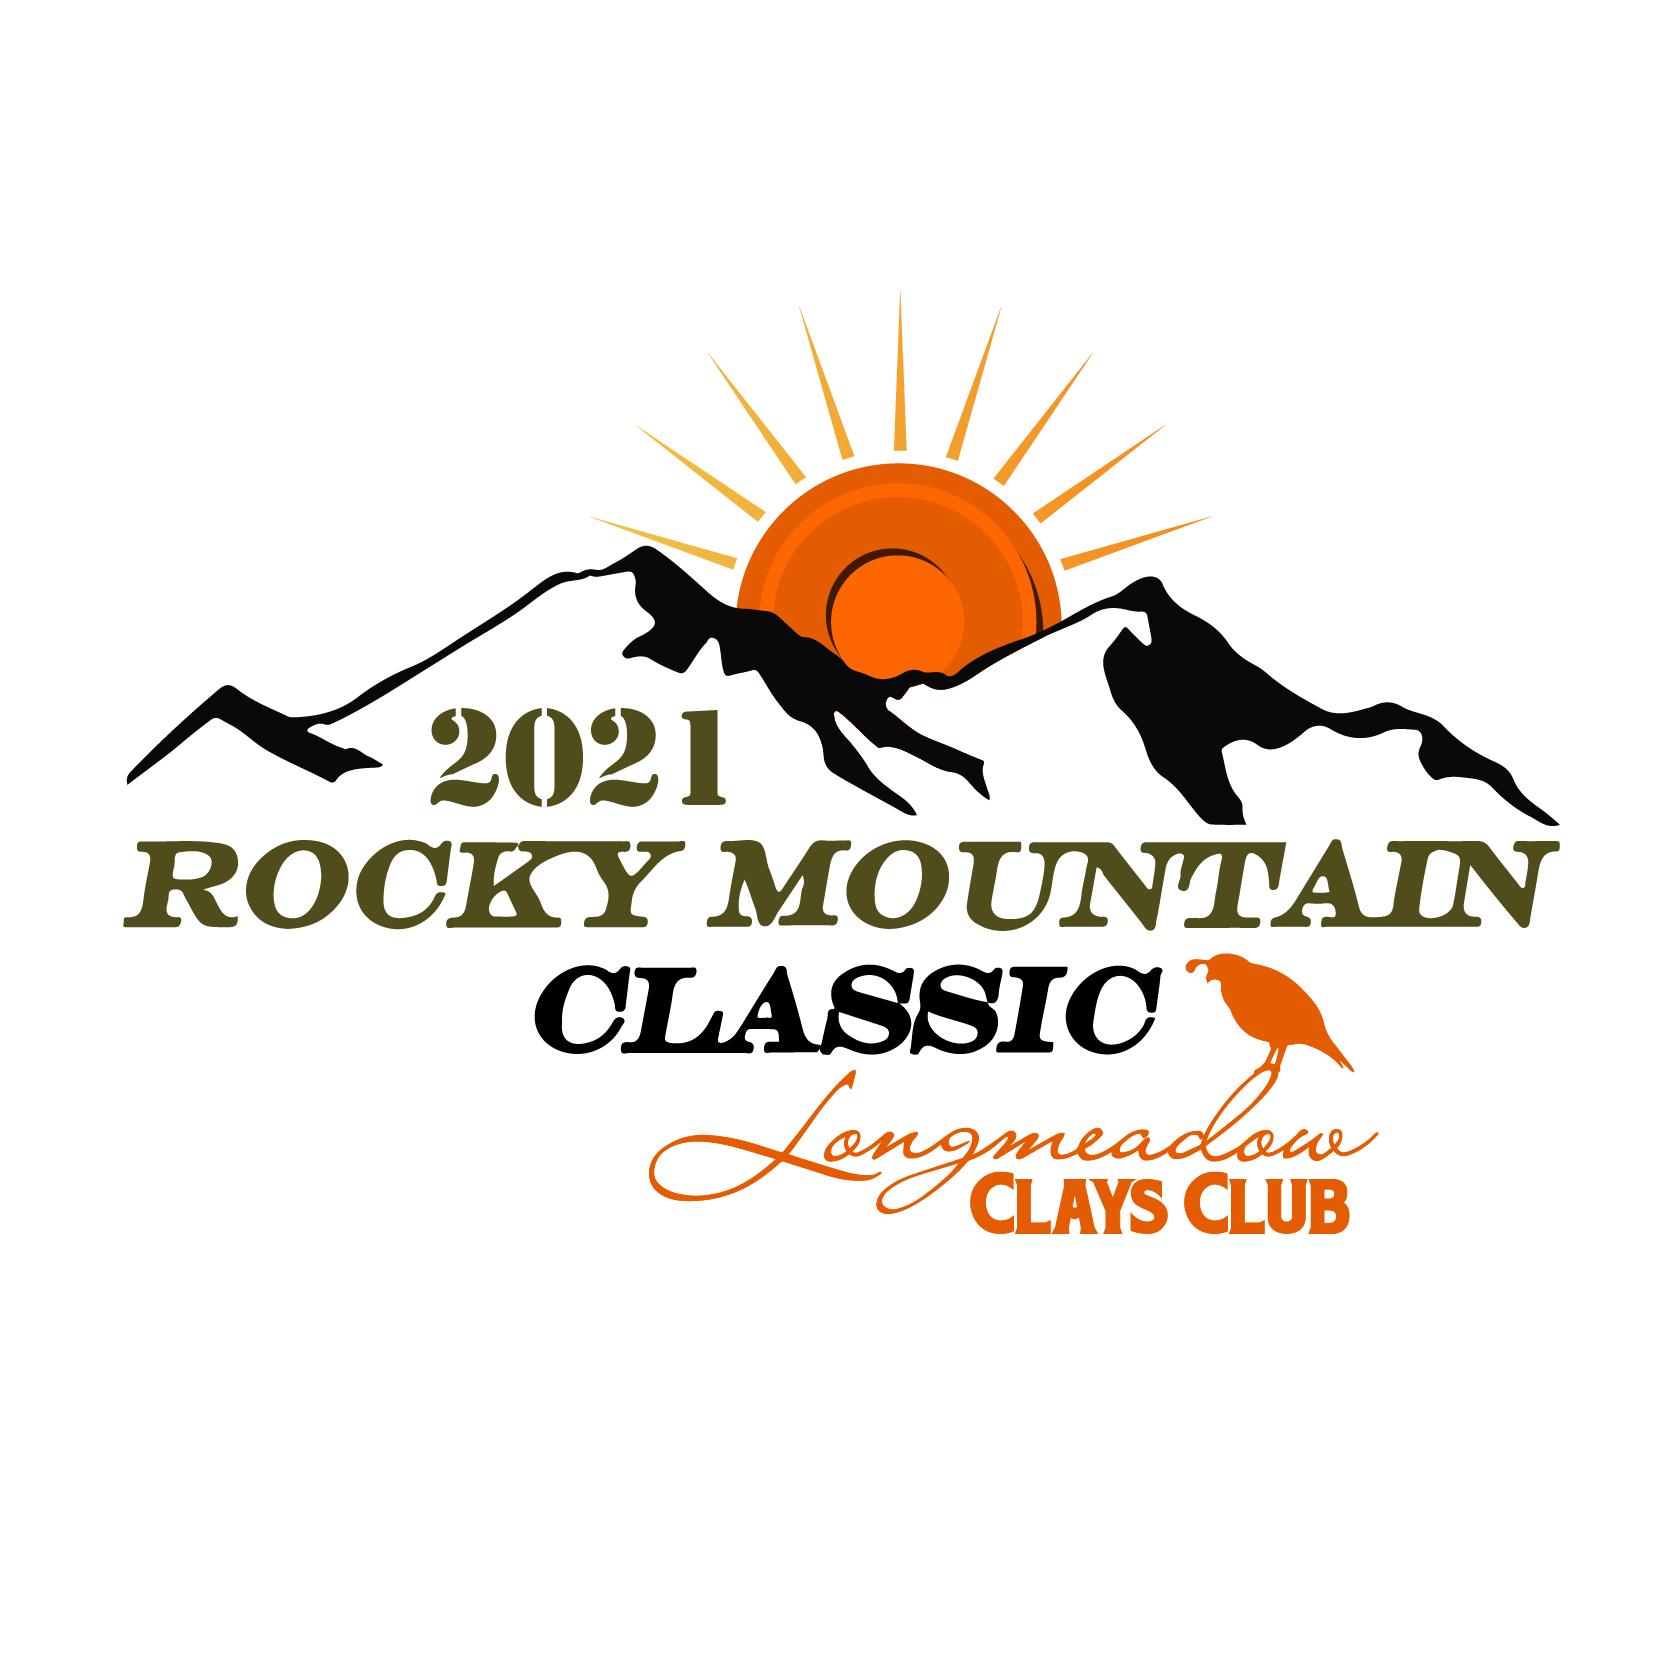 2021 Rocky Mountain Classic